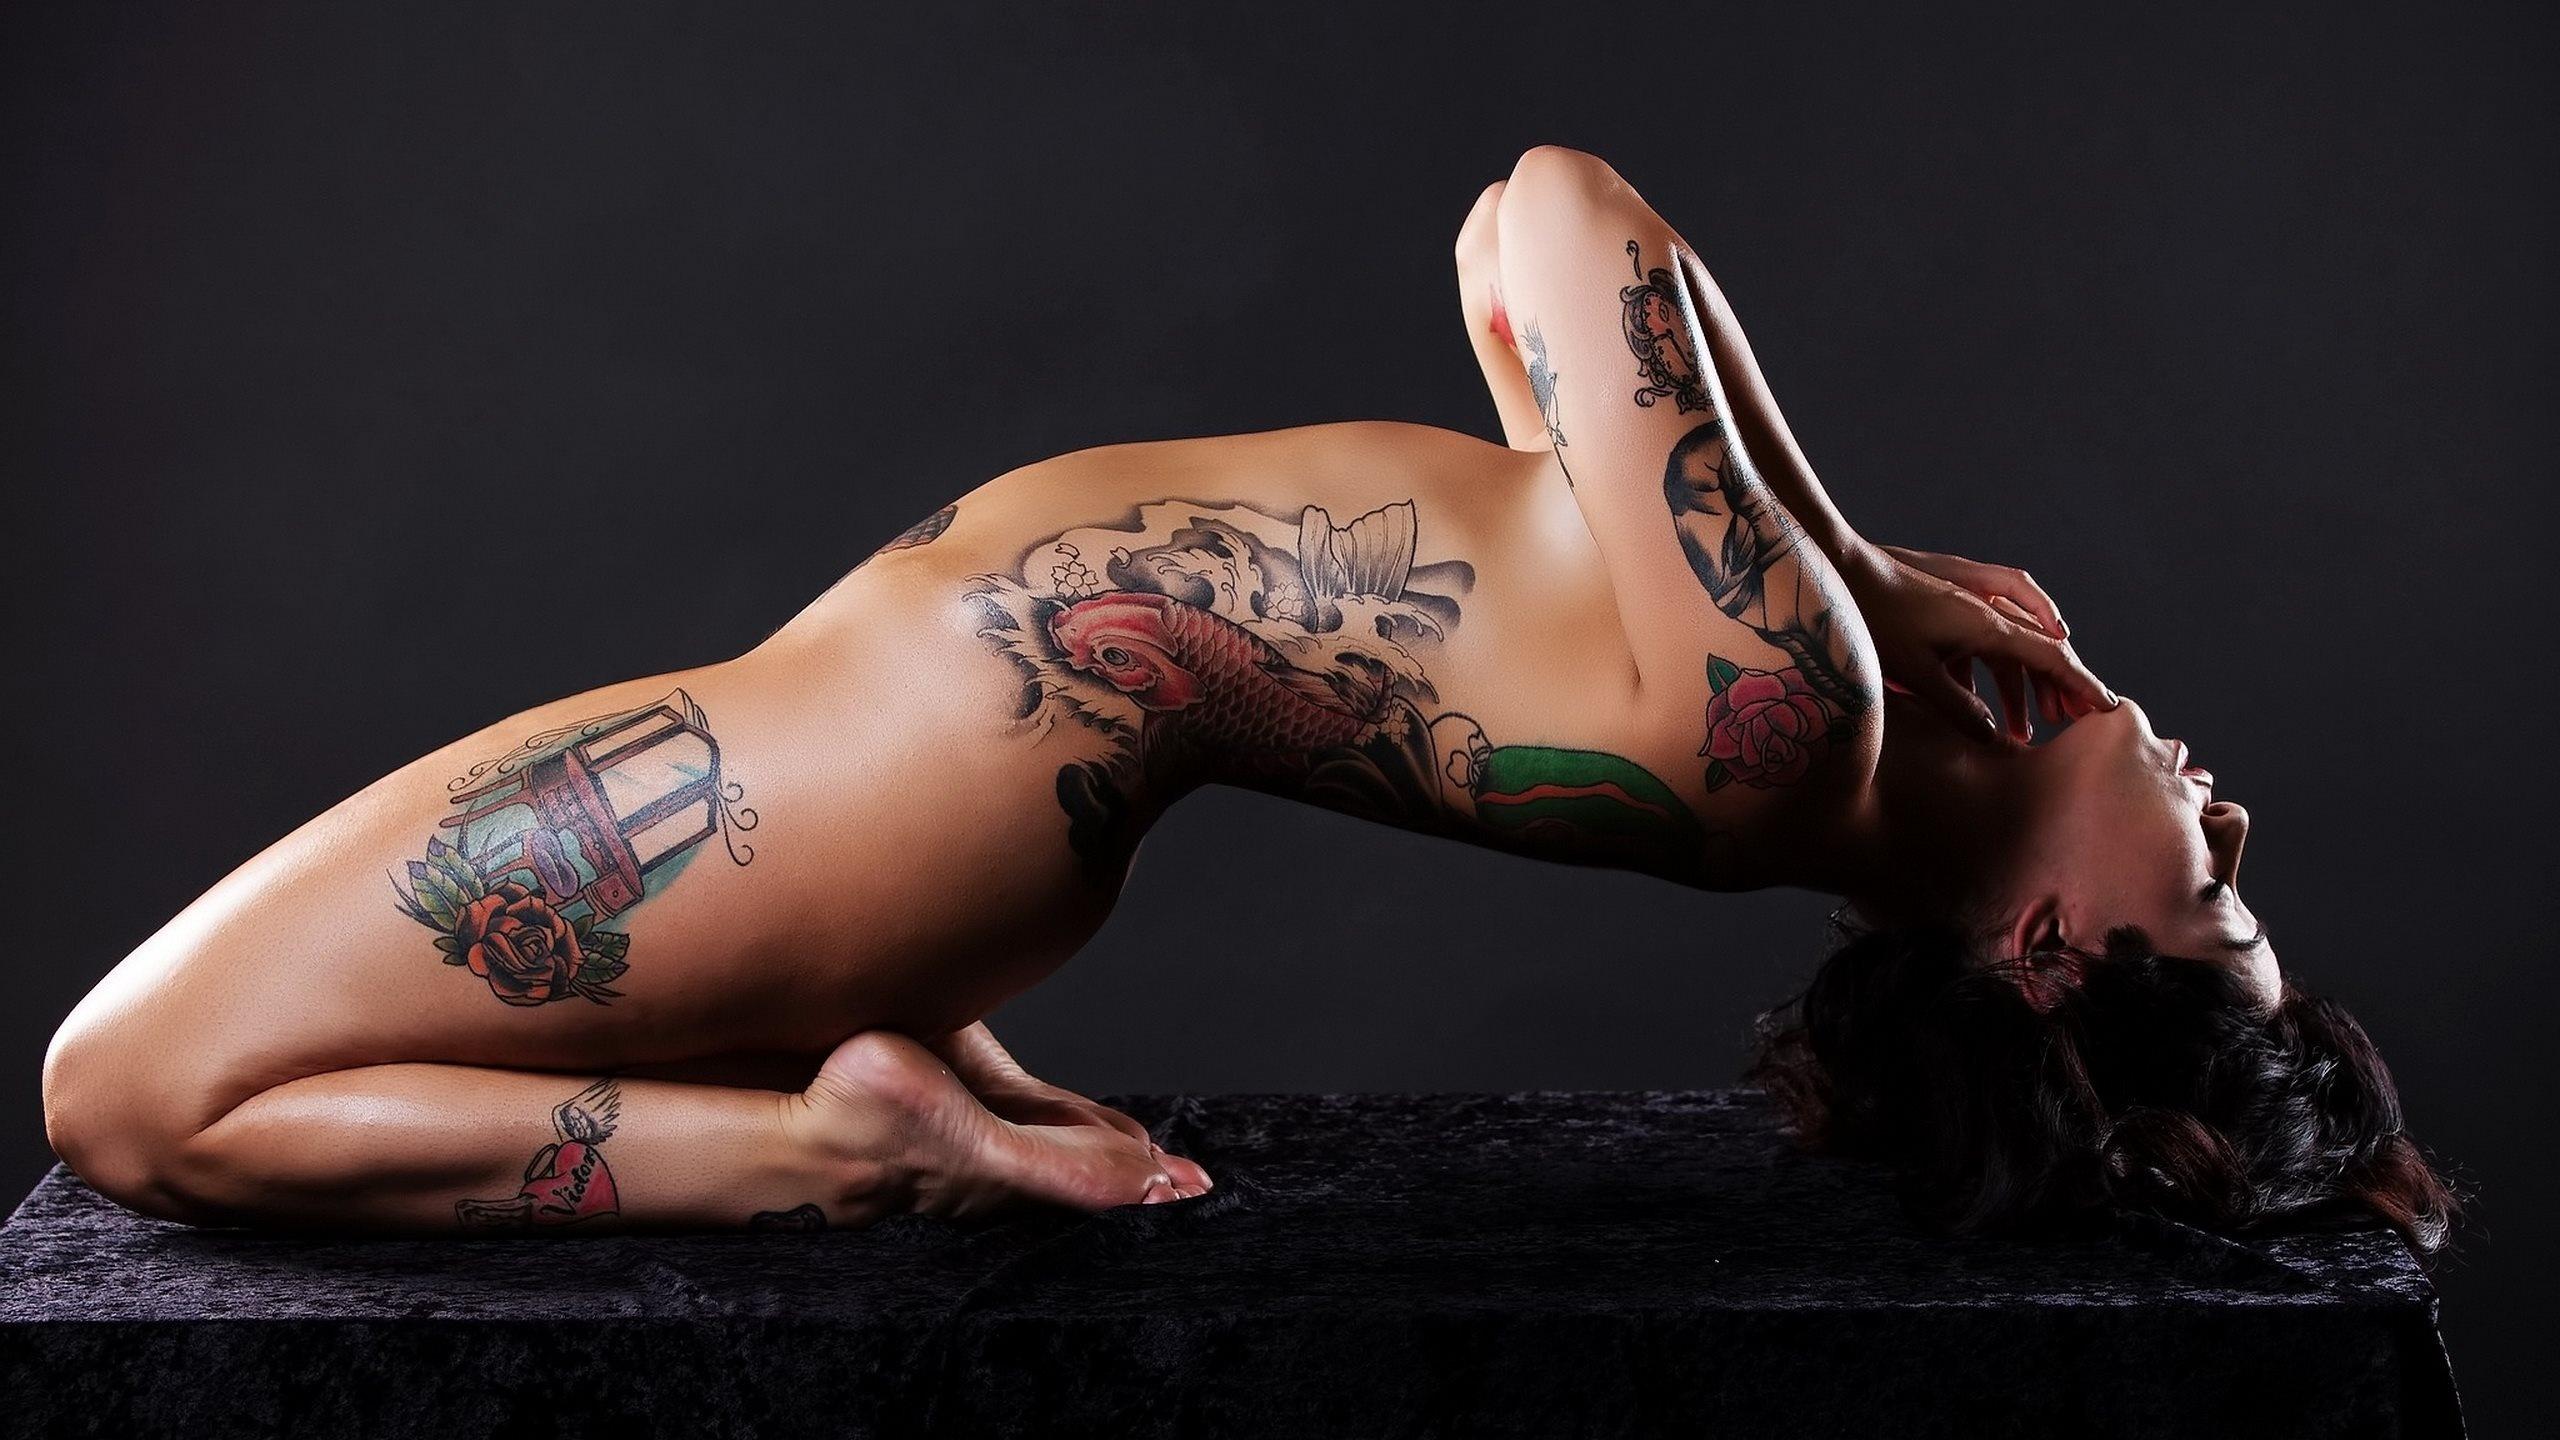 hardcore-naked-tattoo-girls-rosebud-erotic-stories